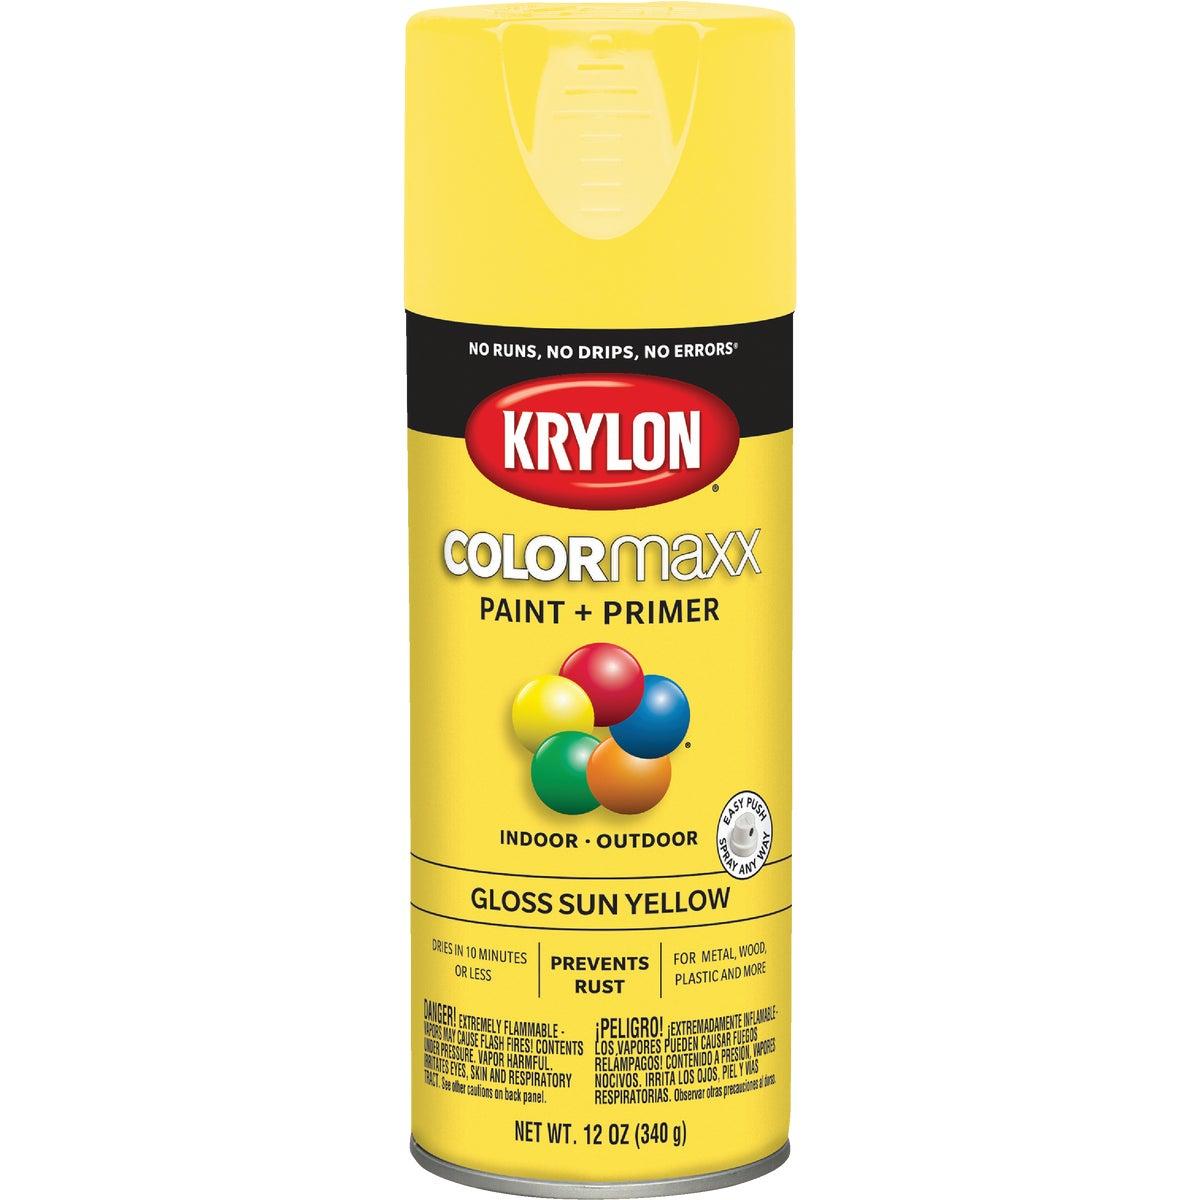 GLS SUN YLLW SPRAY PAINT - 51806 by Krylon/consumer Div